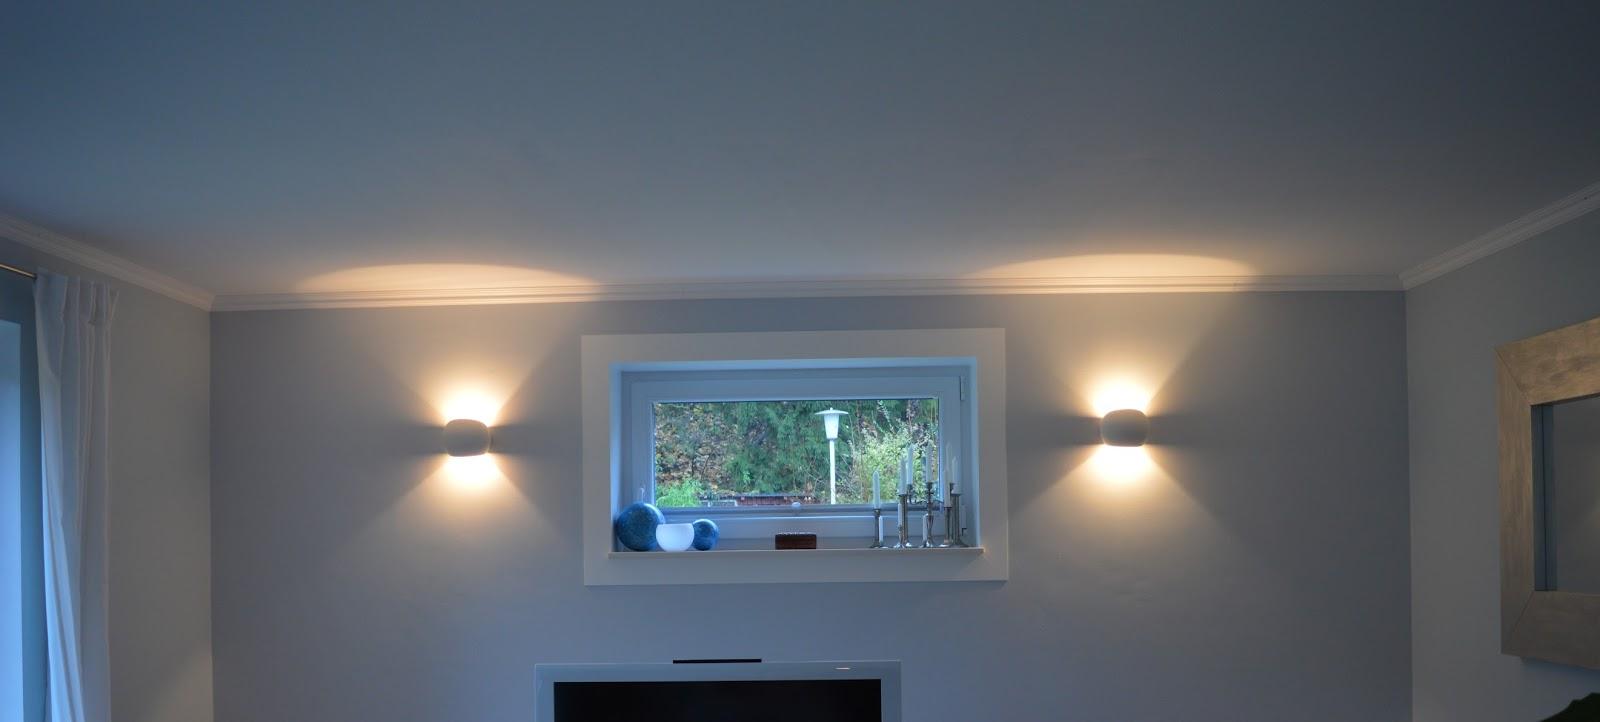 Wandlampen Wohnzimmer Wandlampen Wohnzimmer Gt